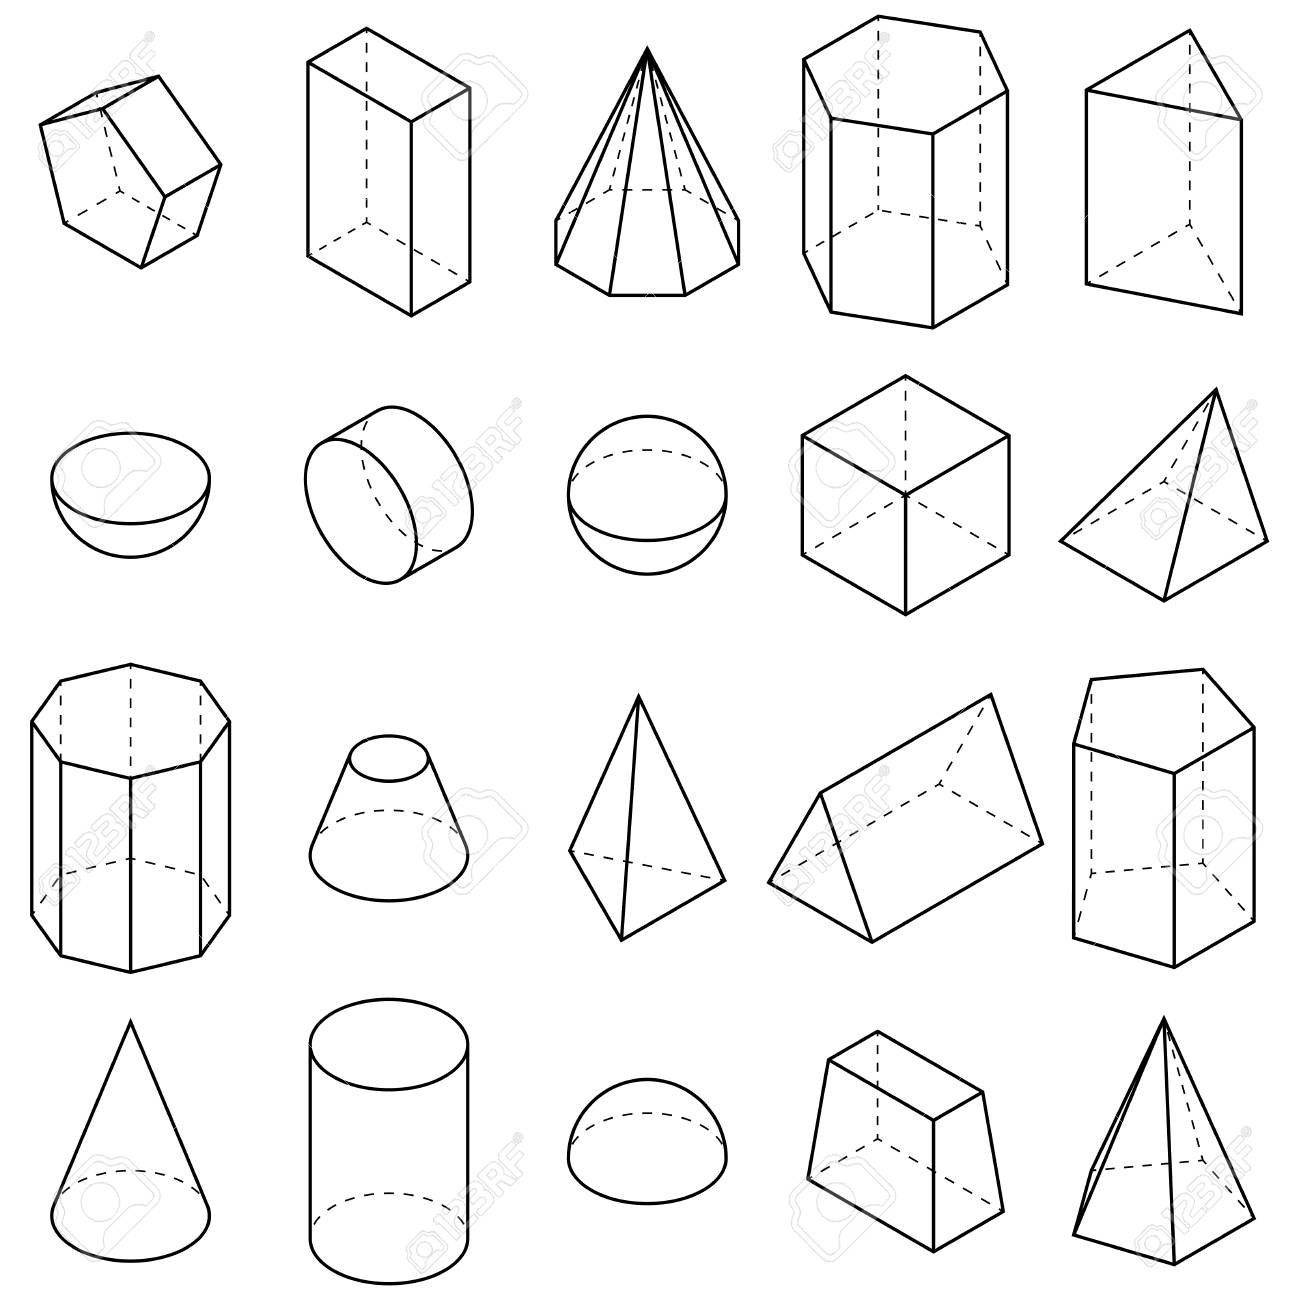 Set of geometric shapes. Isometric views. Vector illustration - 124857451